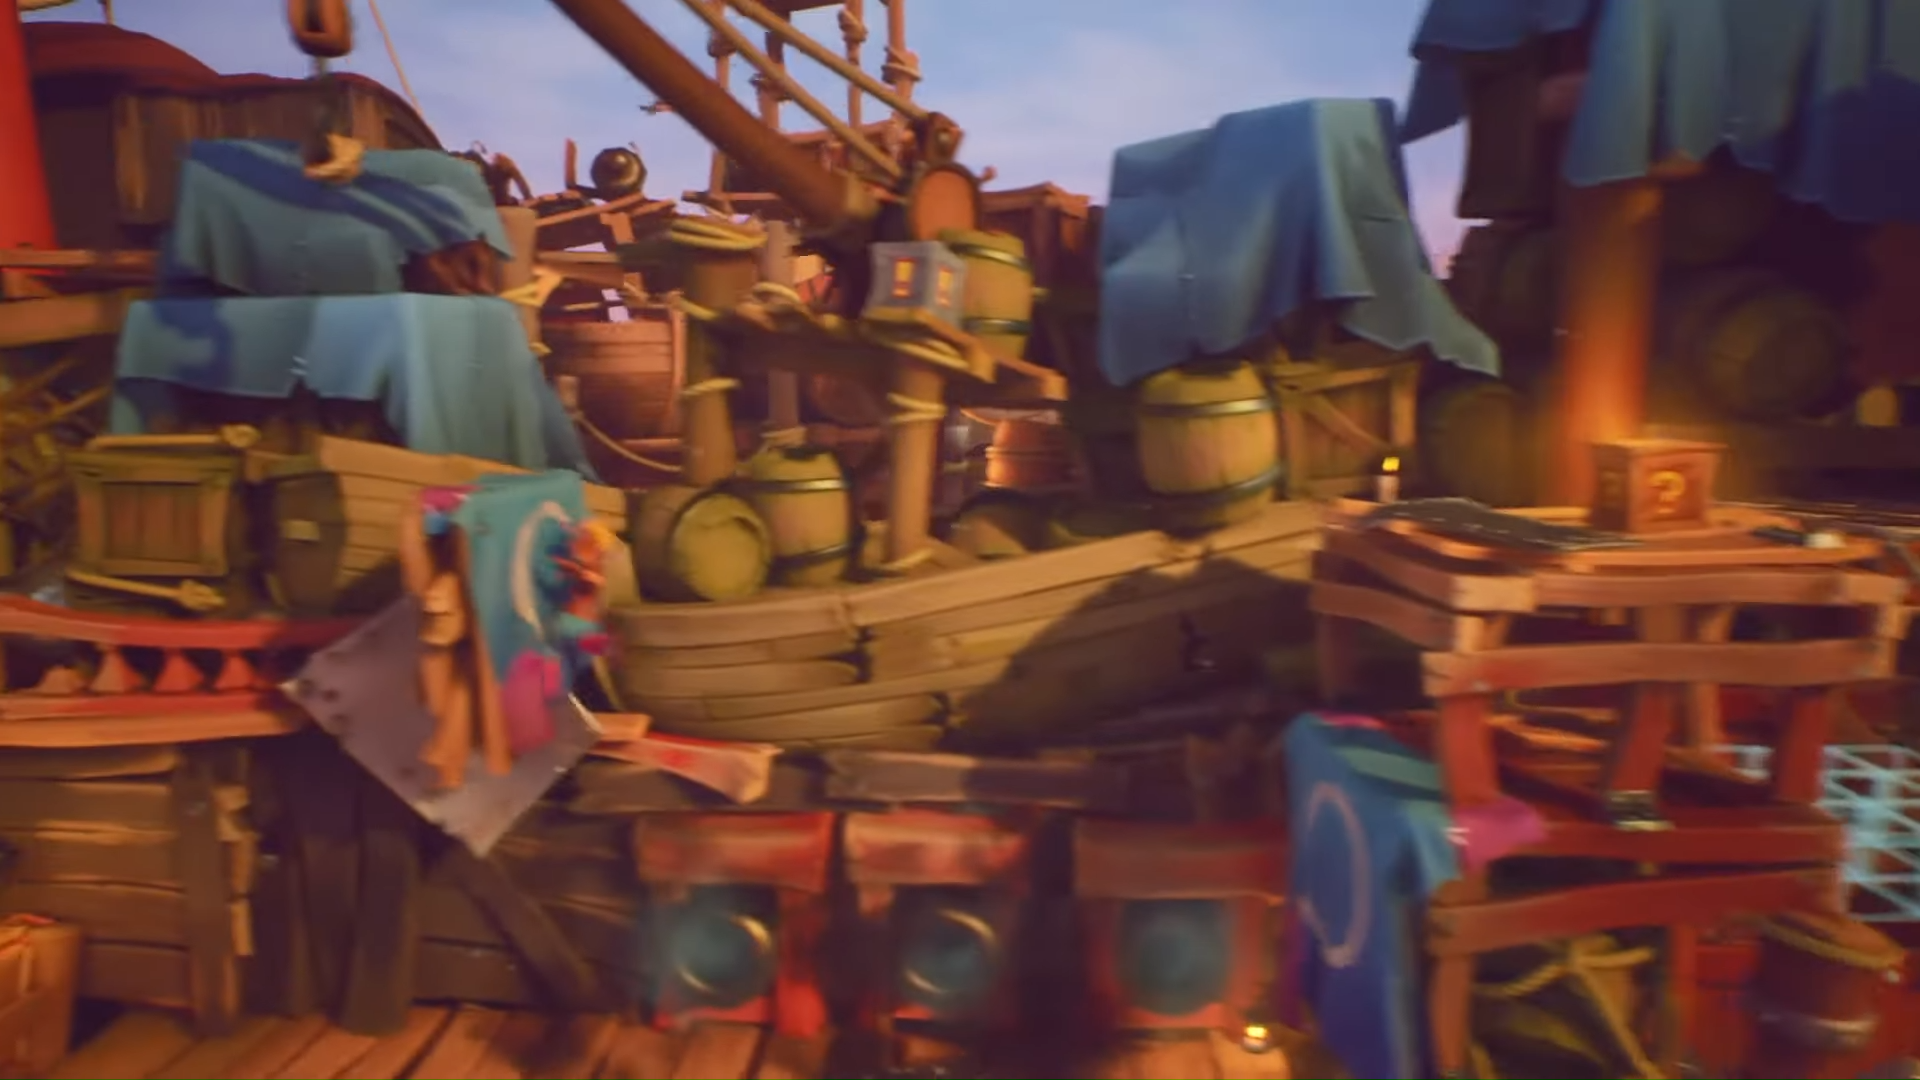 Crash Bandicoot 4: svelato il gameplay di Tawna Bandicoot 4